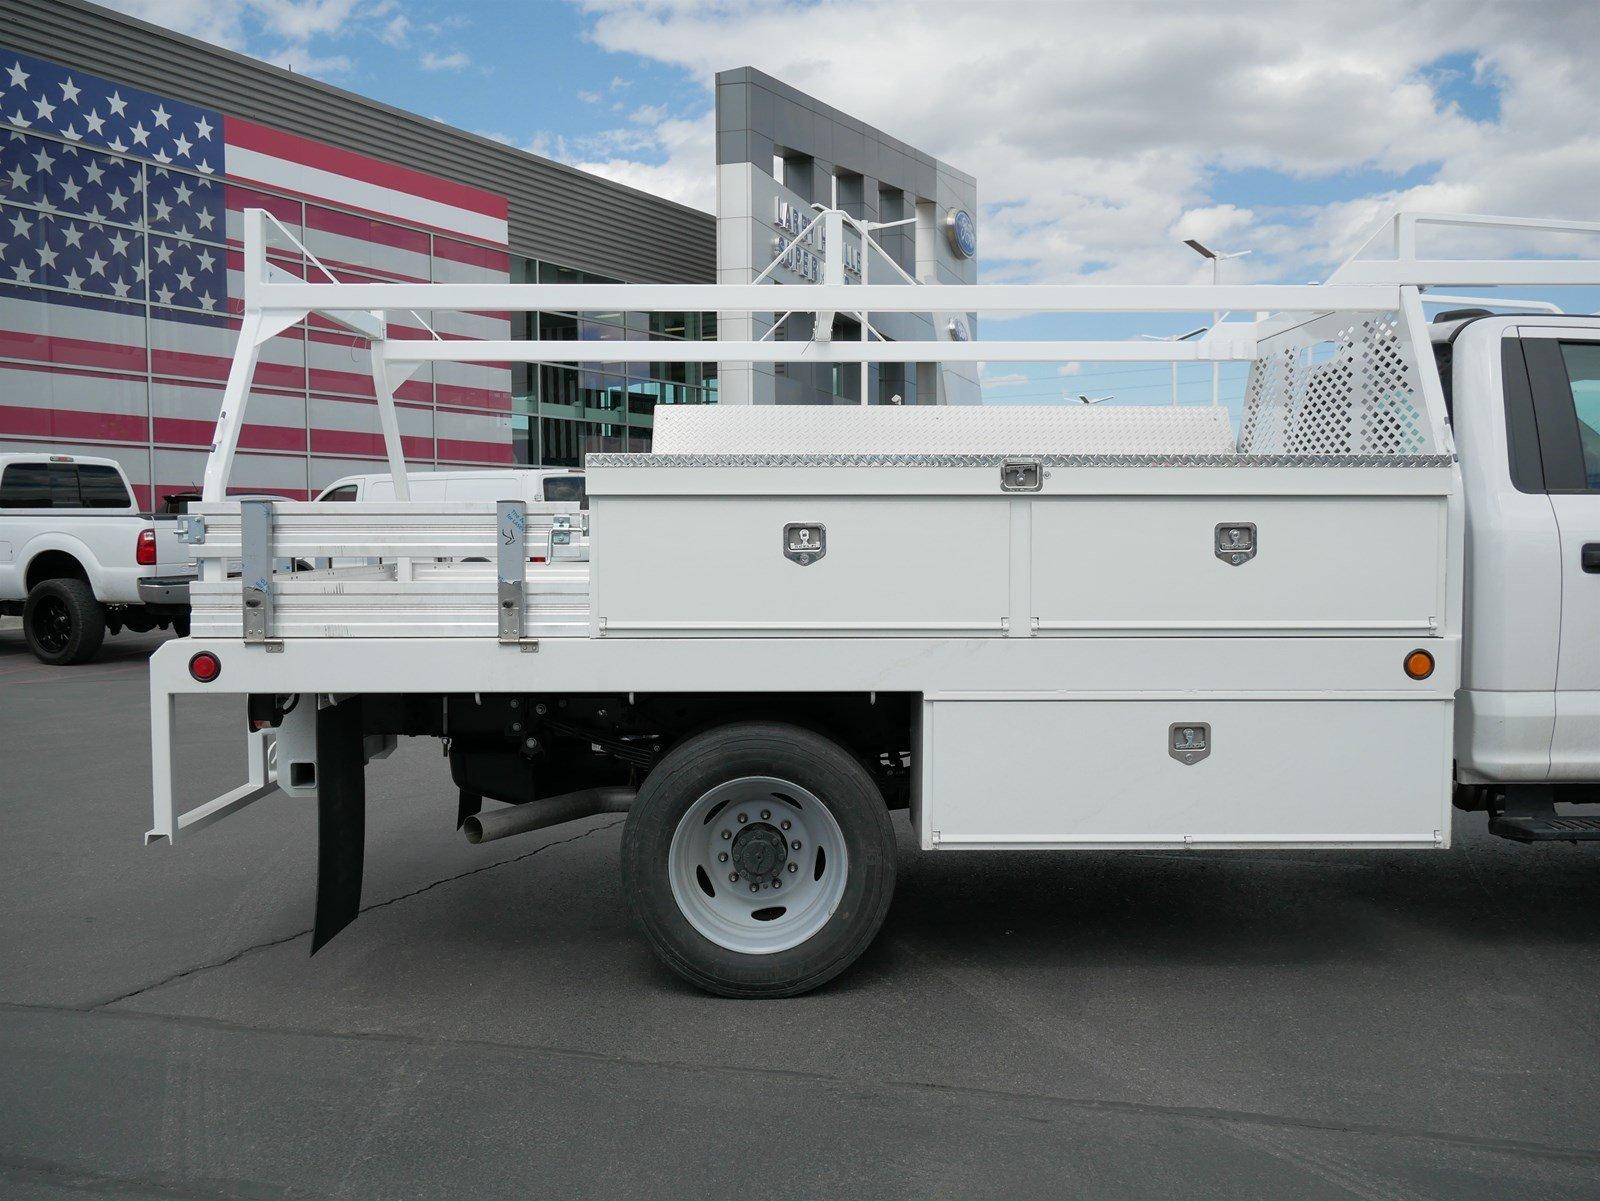 2020 F-550 Regular Cab DRW 4x4, Scelzi CTFB Contractor Body #63090 - photo 15